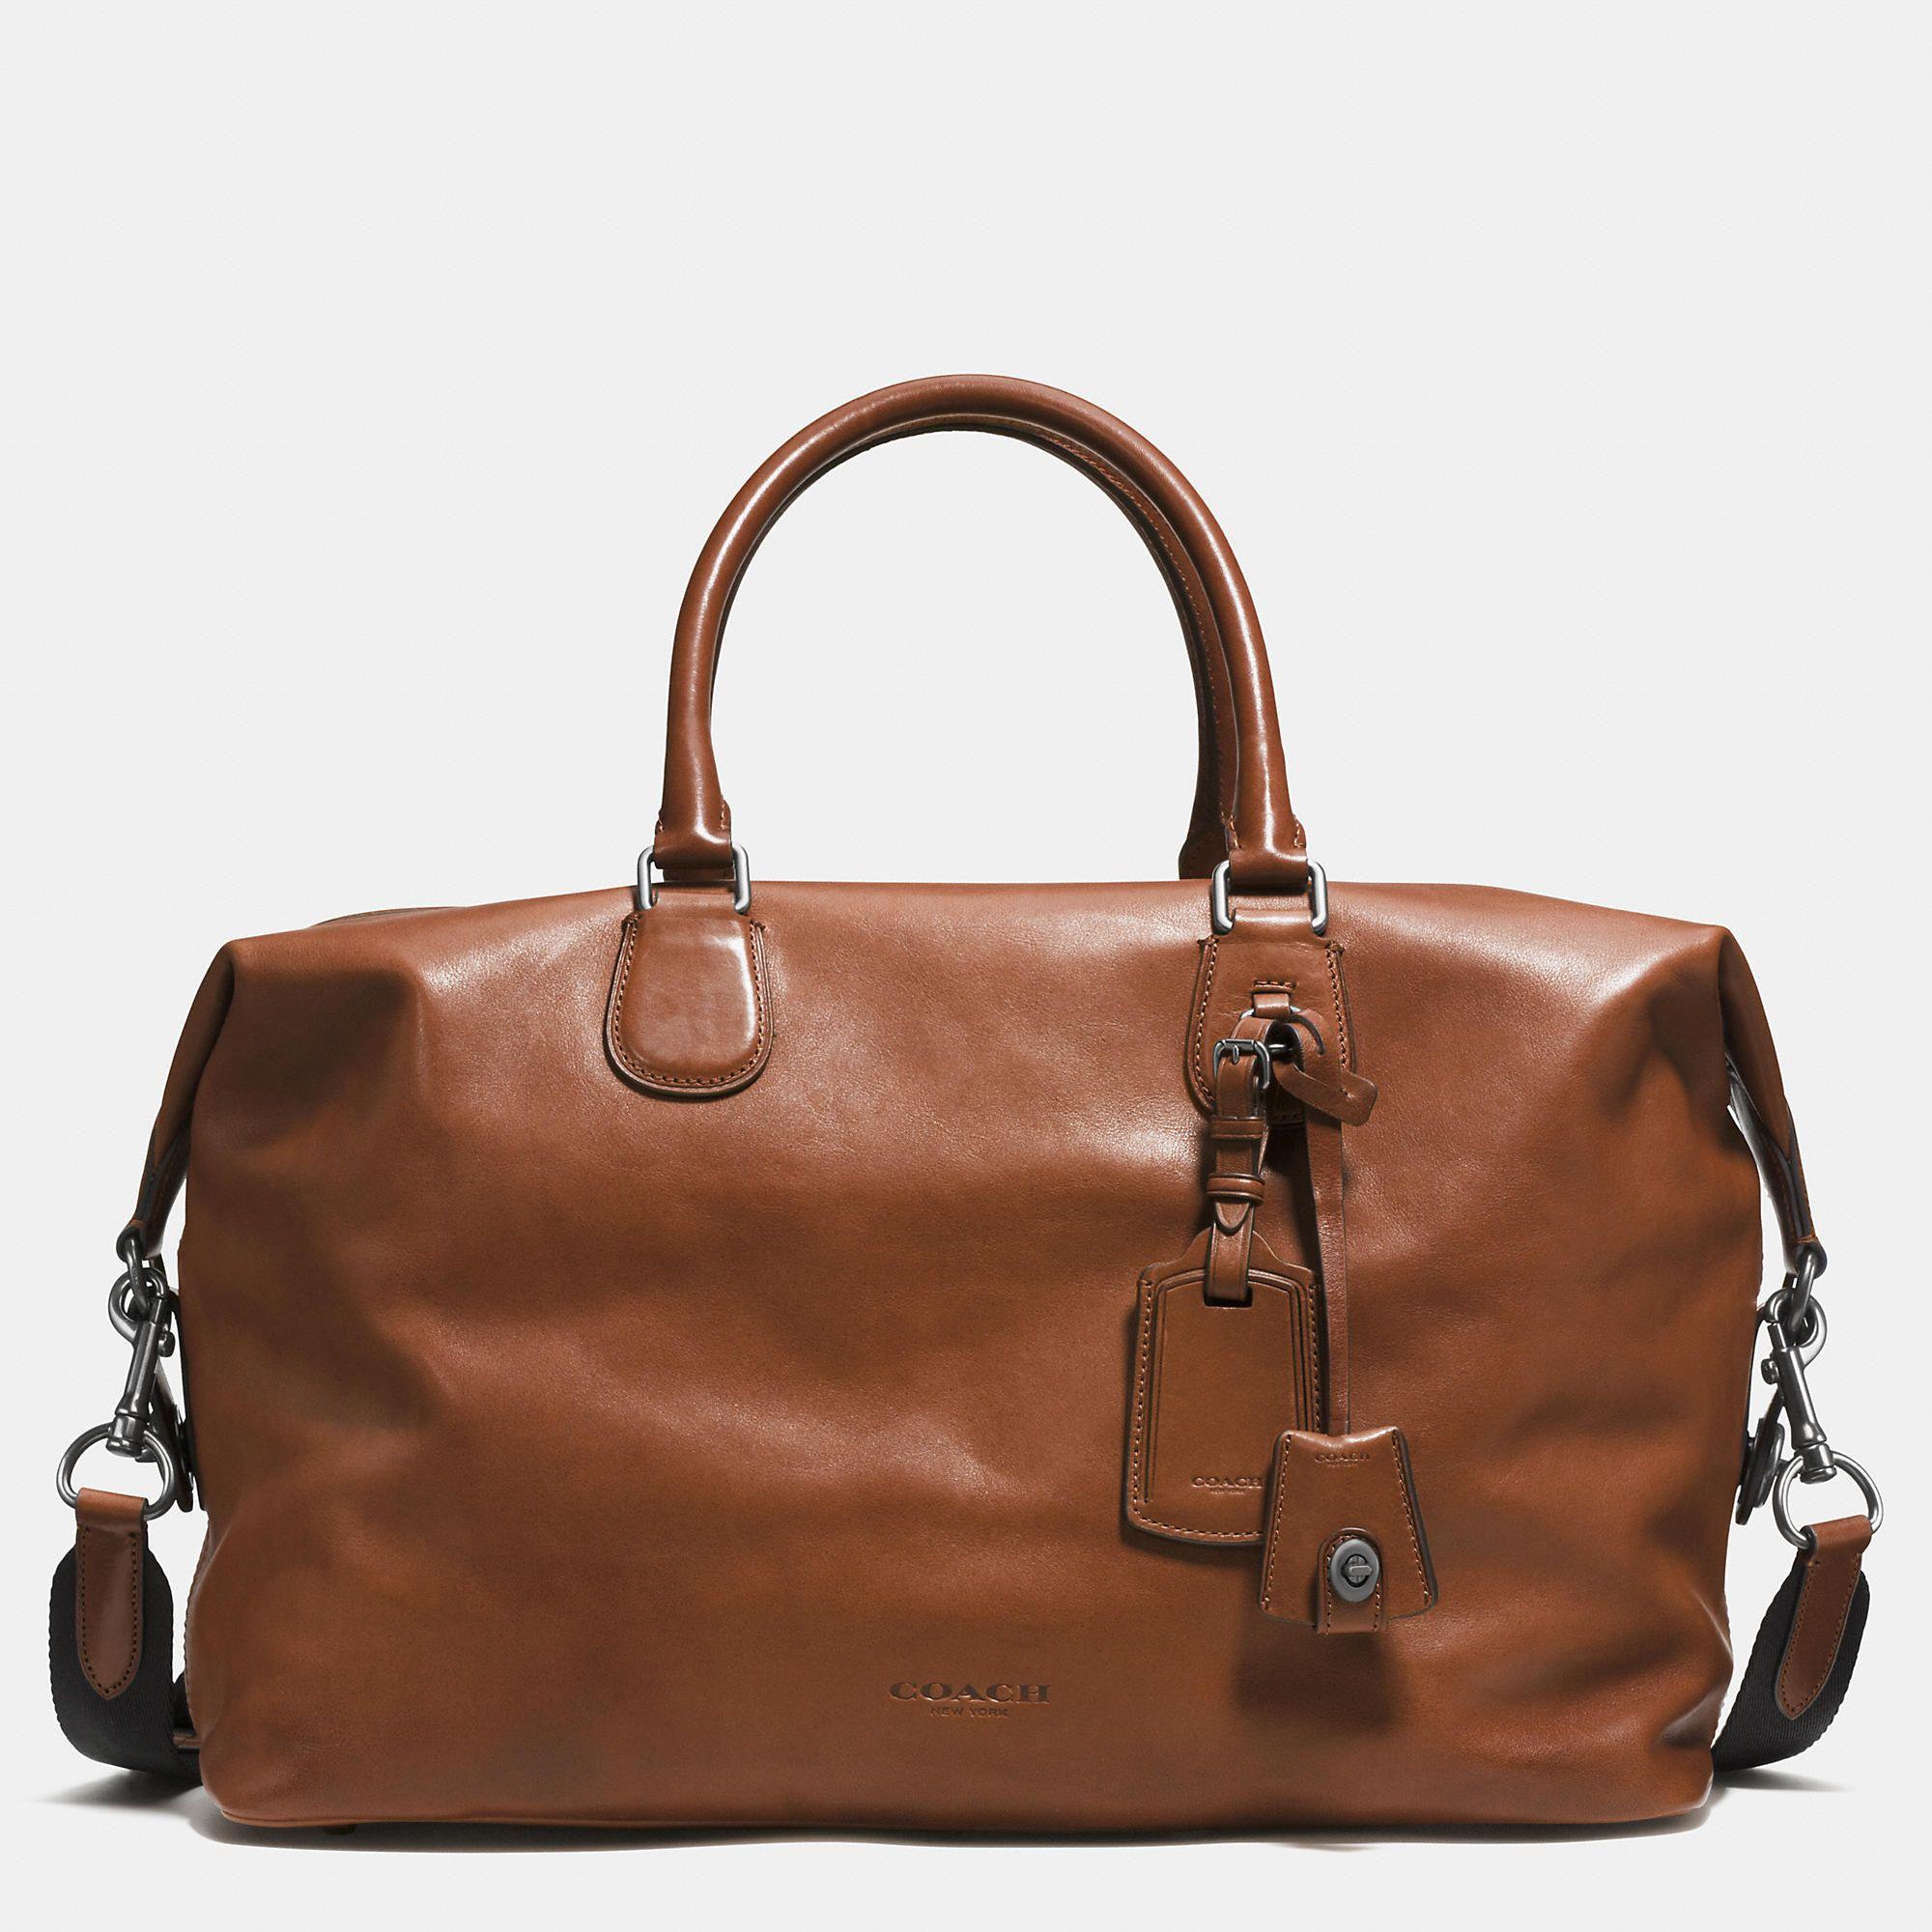 c45a88ca8 Explorer bag in sport calf leather | MENS LAPTOP & BACKPACK LAPTOPS ...